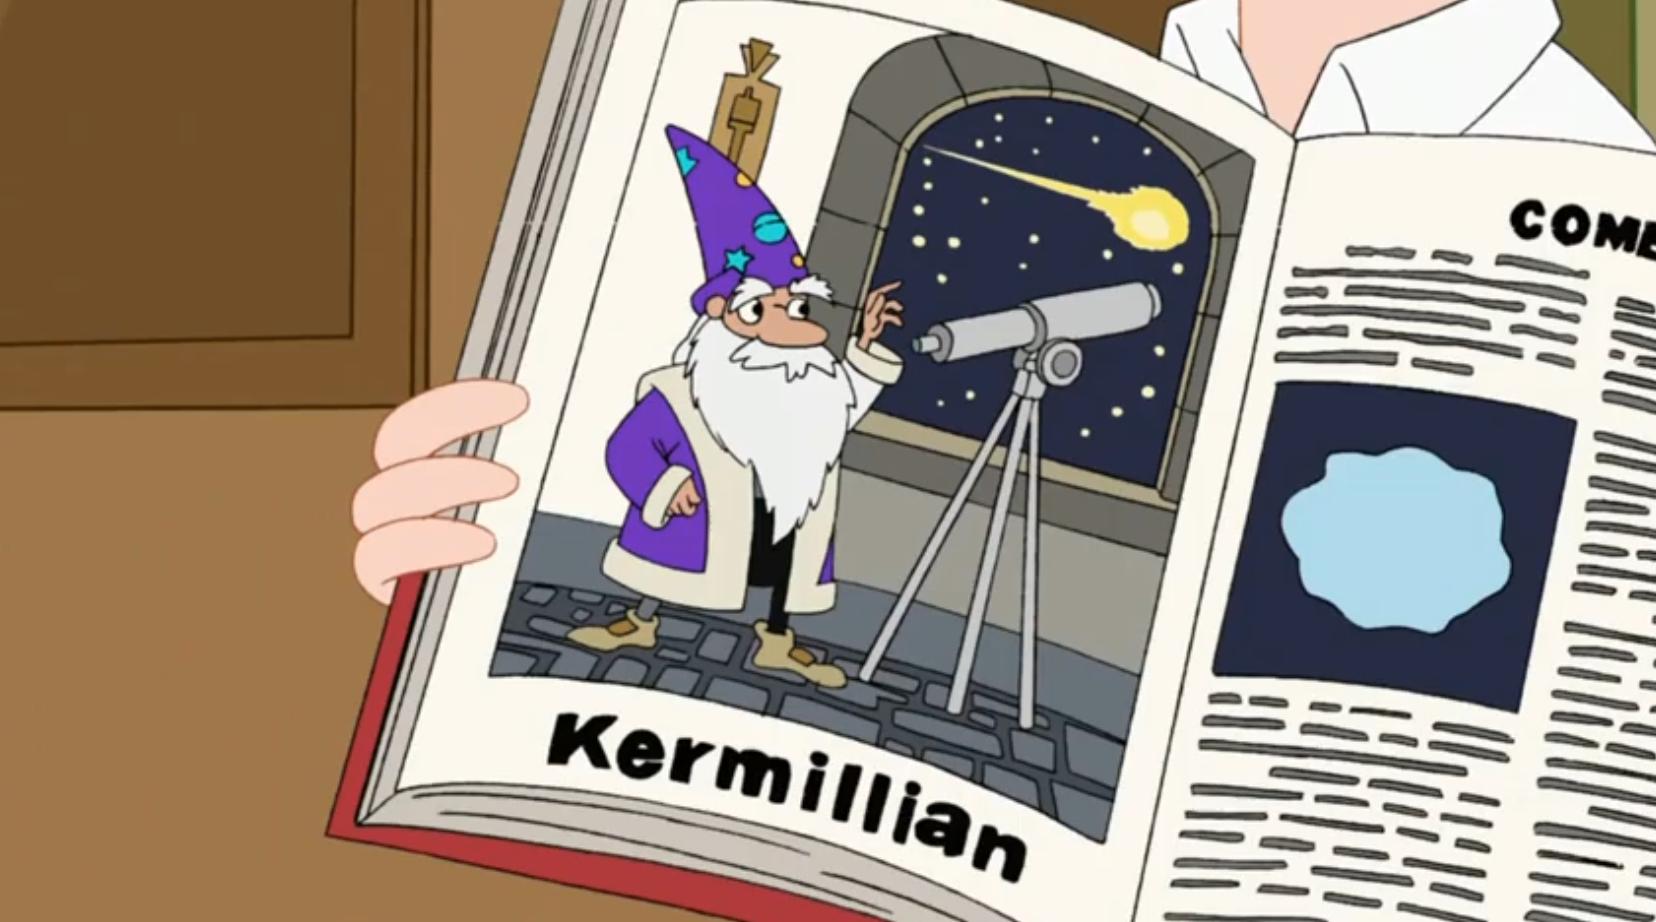 Augustus Kermillian